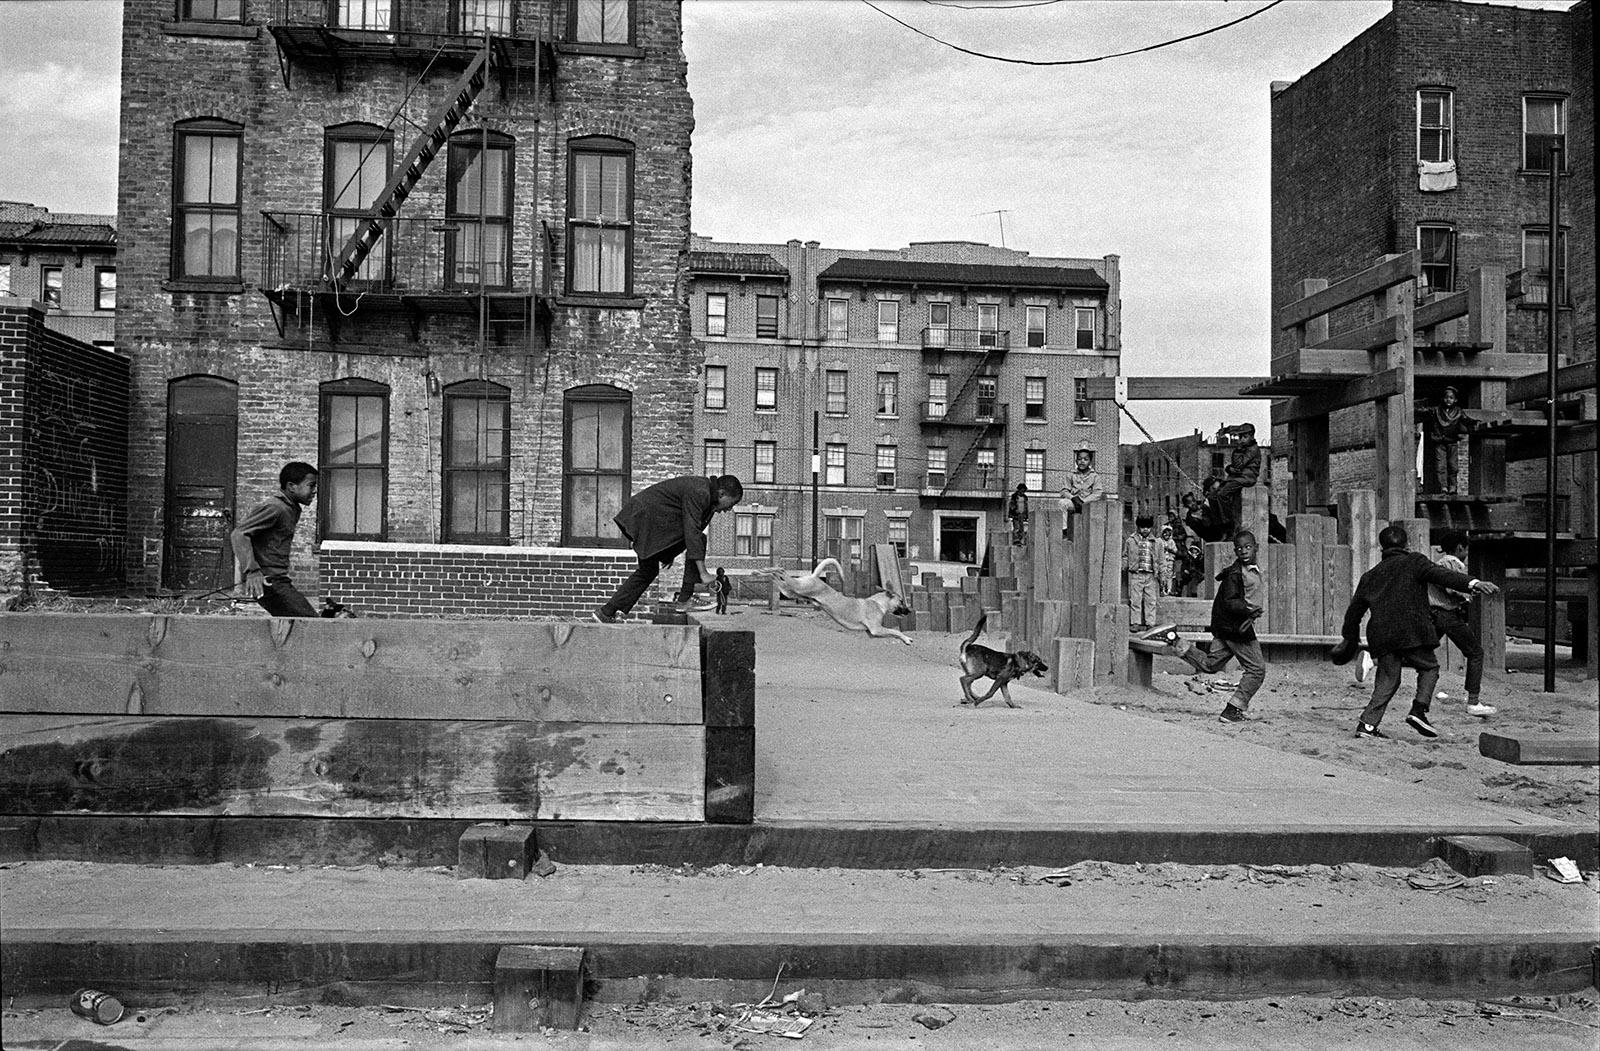 Kids in a Brooklyn neighborhood, 1969